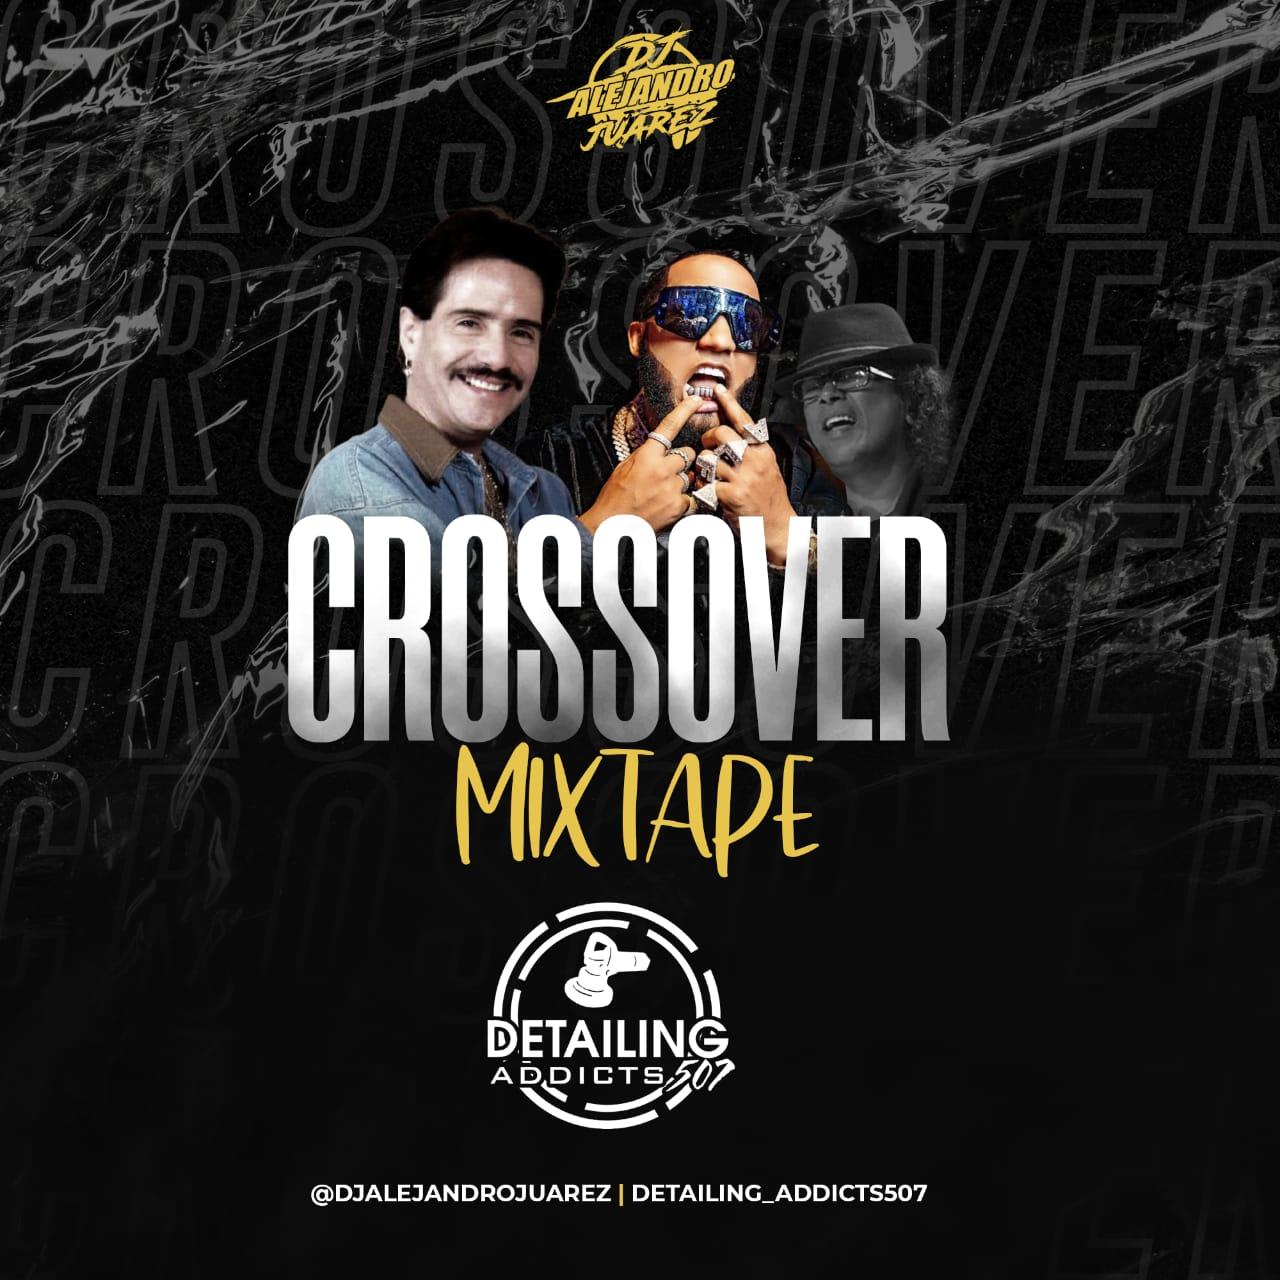 @DjAlejandroJuarez - Crossover Mixtape @Detailing_Addicts507